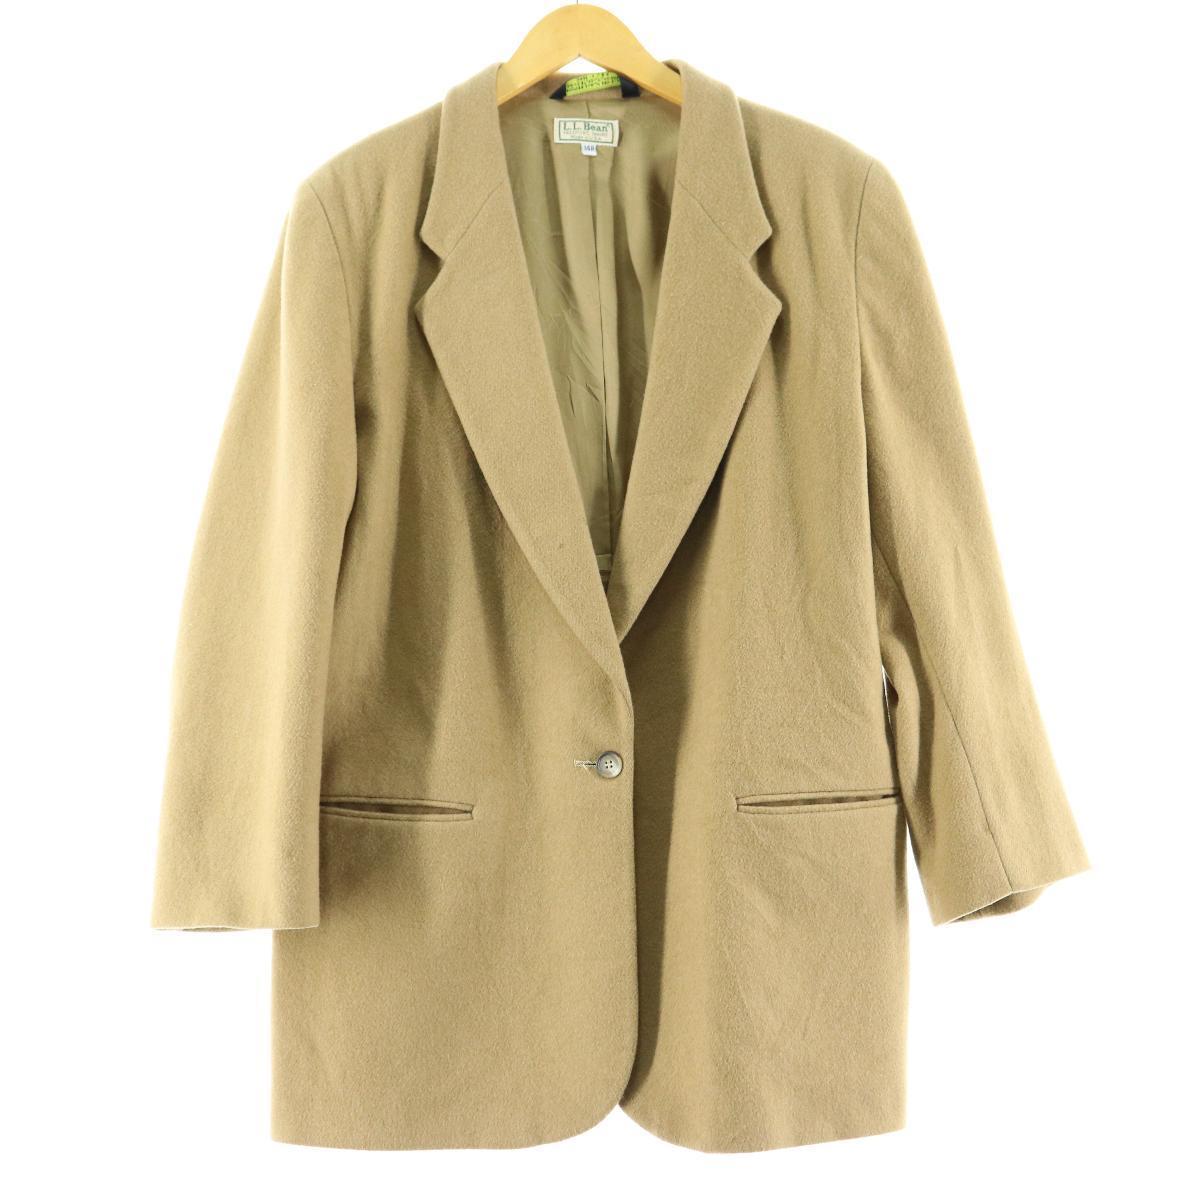 L.L.Bean ウール テーラードジャケット